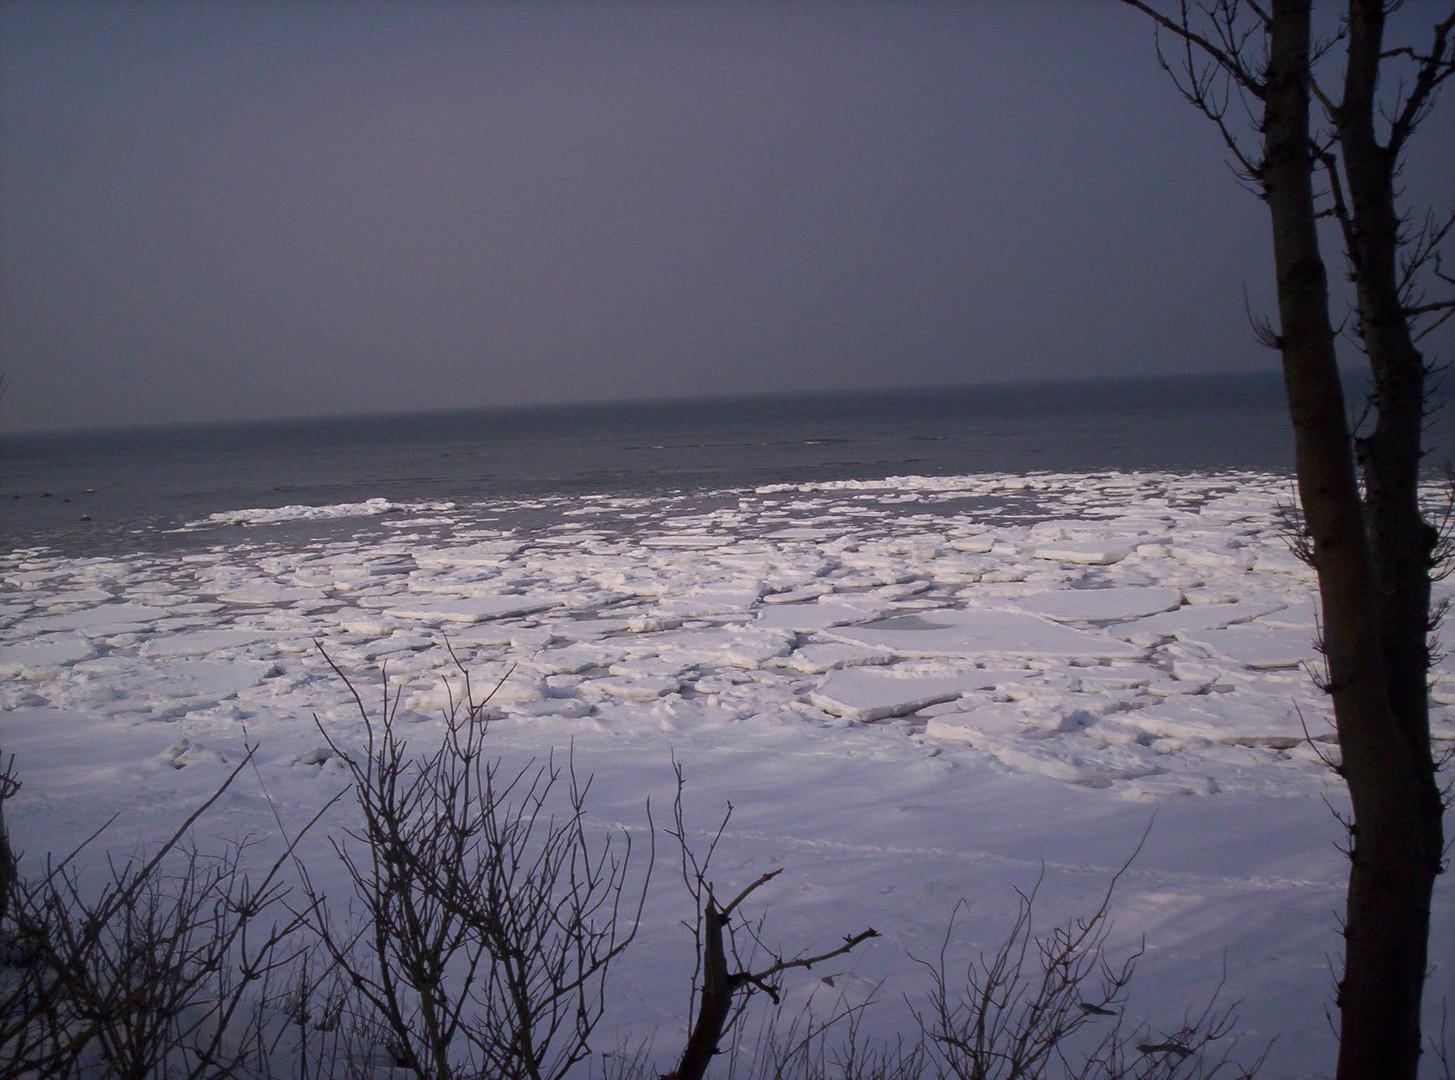 Februar 2010 auf der Insel Poel